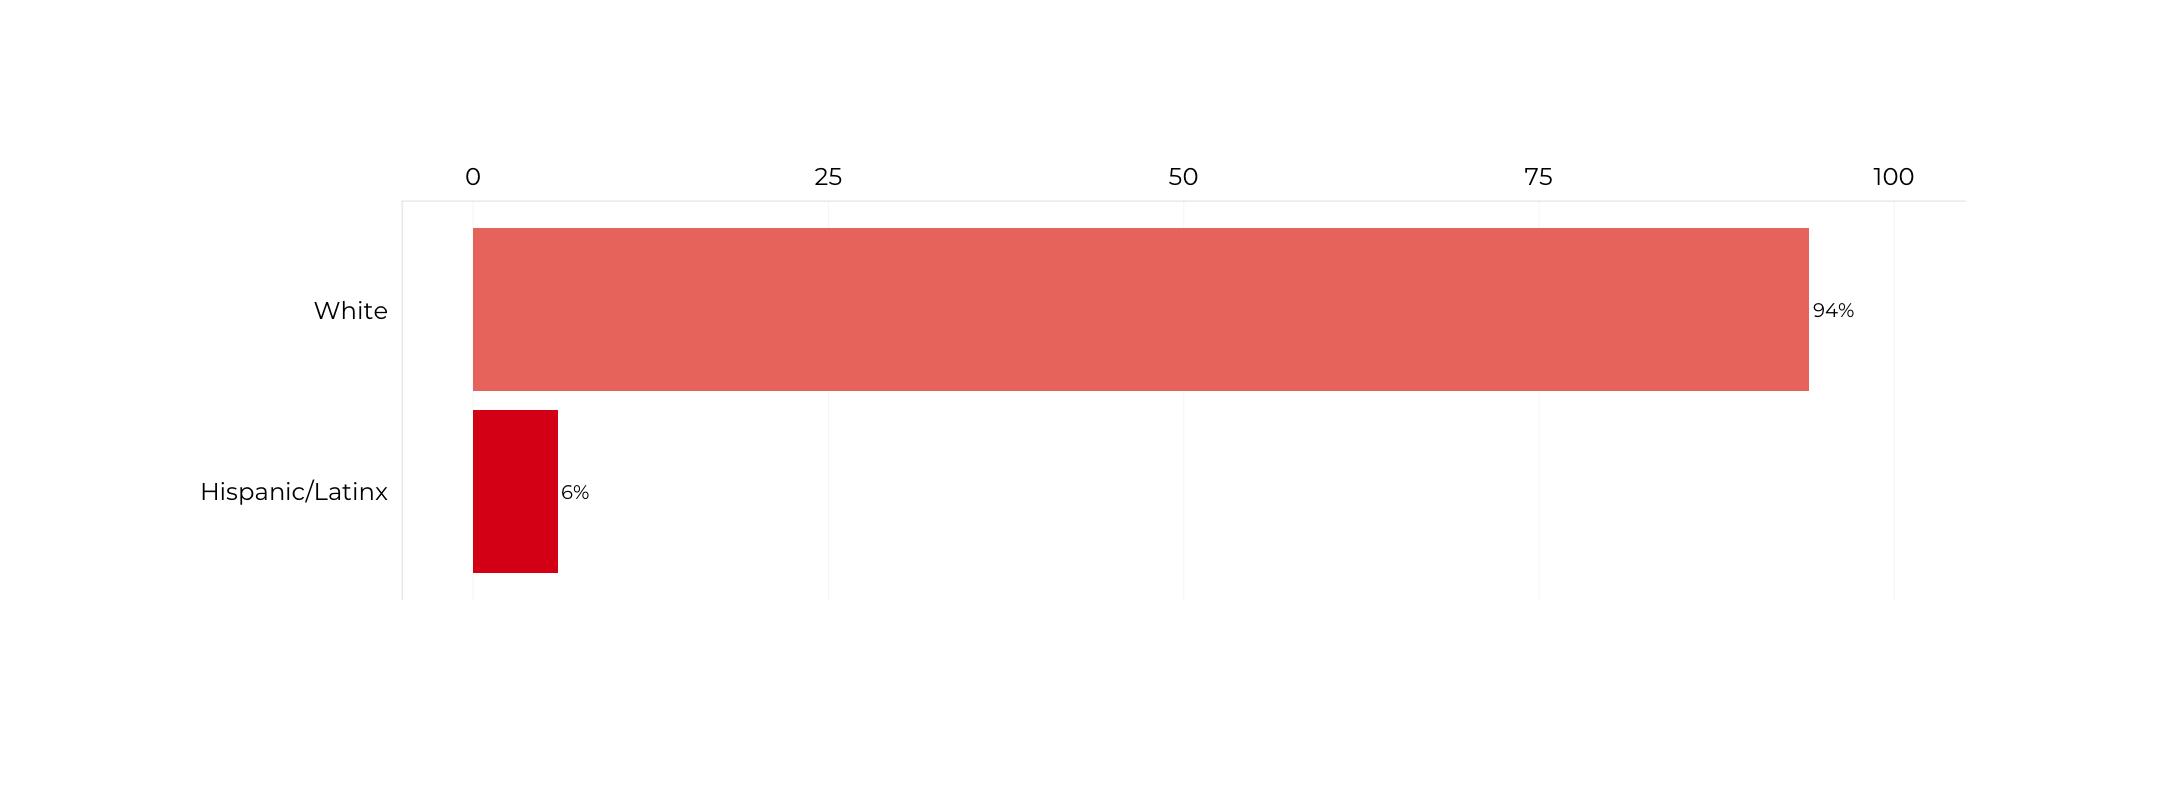 Graph about Racial Composition of Deputy Secretaries of Energy. More detailed text description below.